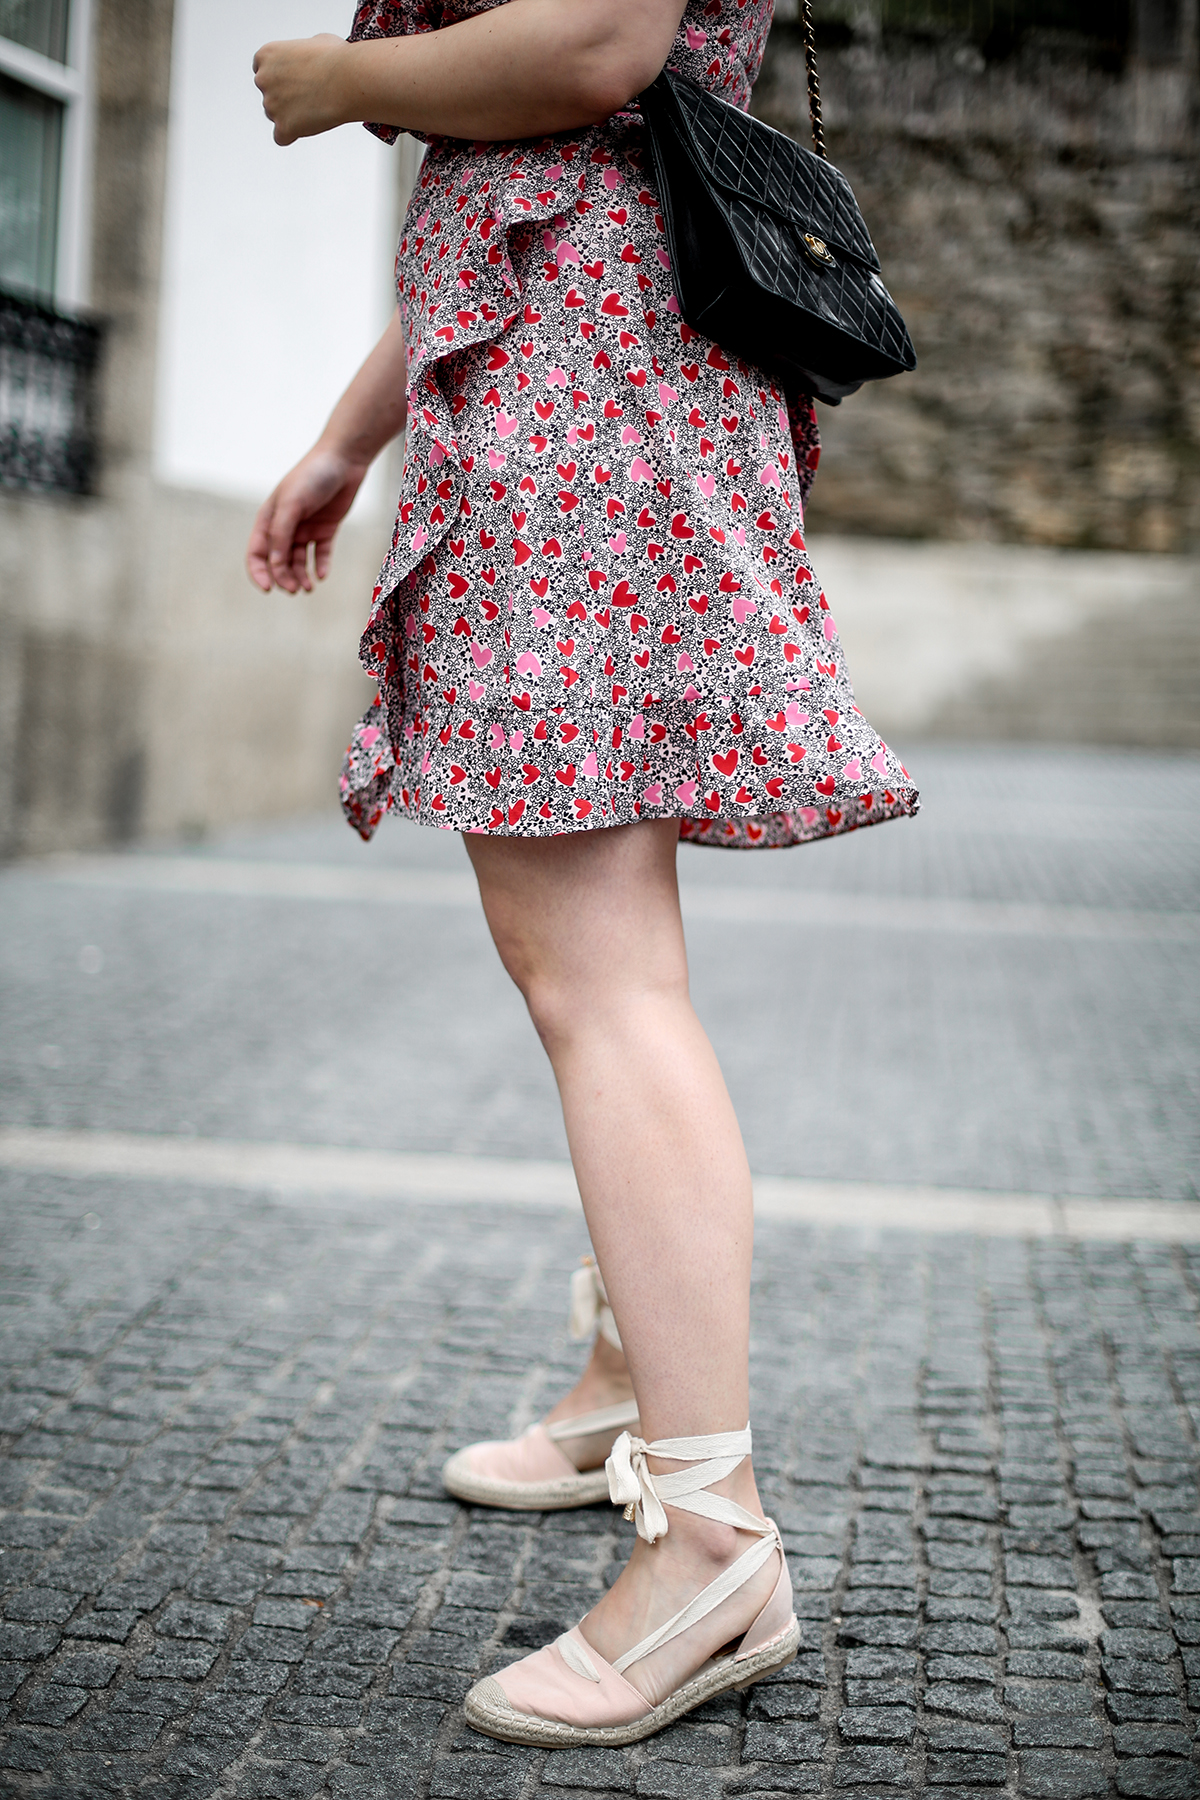 vestido-volantes-cruzado-joanie-clothing-chanel-vintage-alpargatas-shop-cherie4